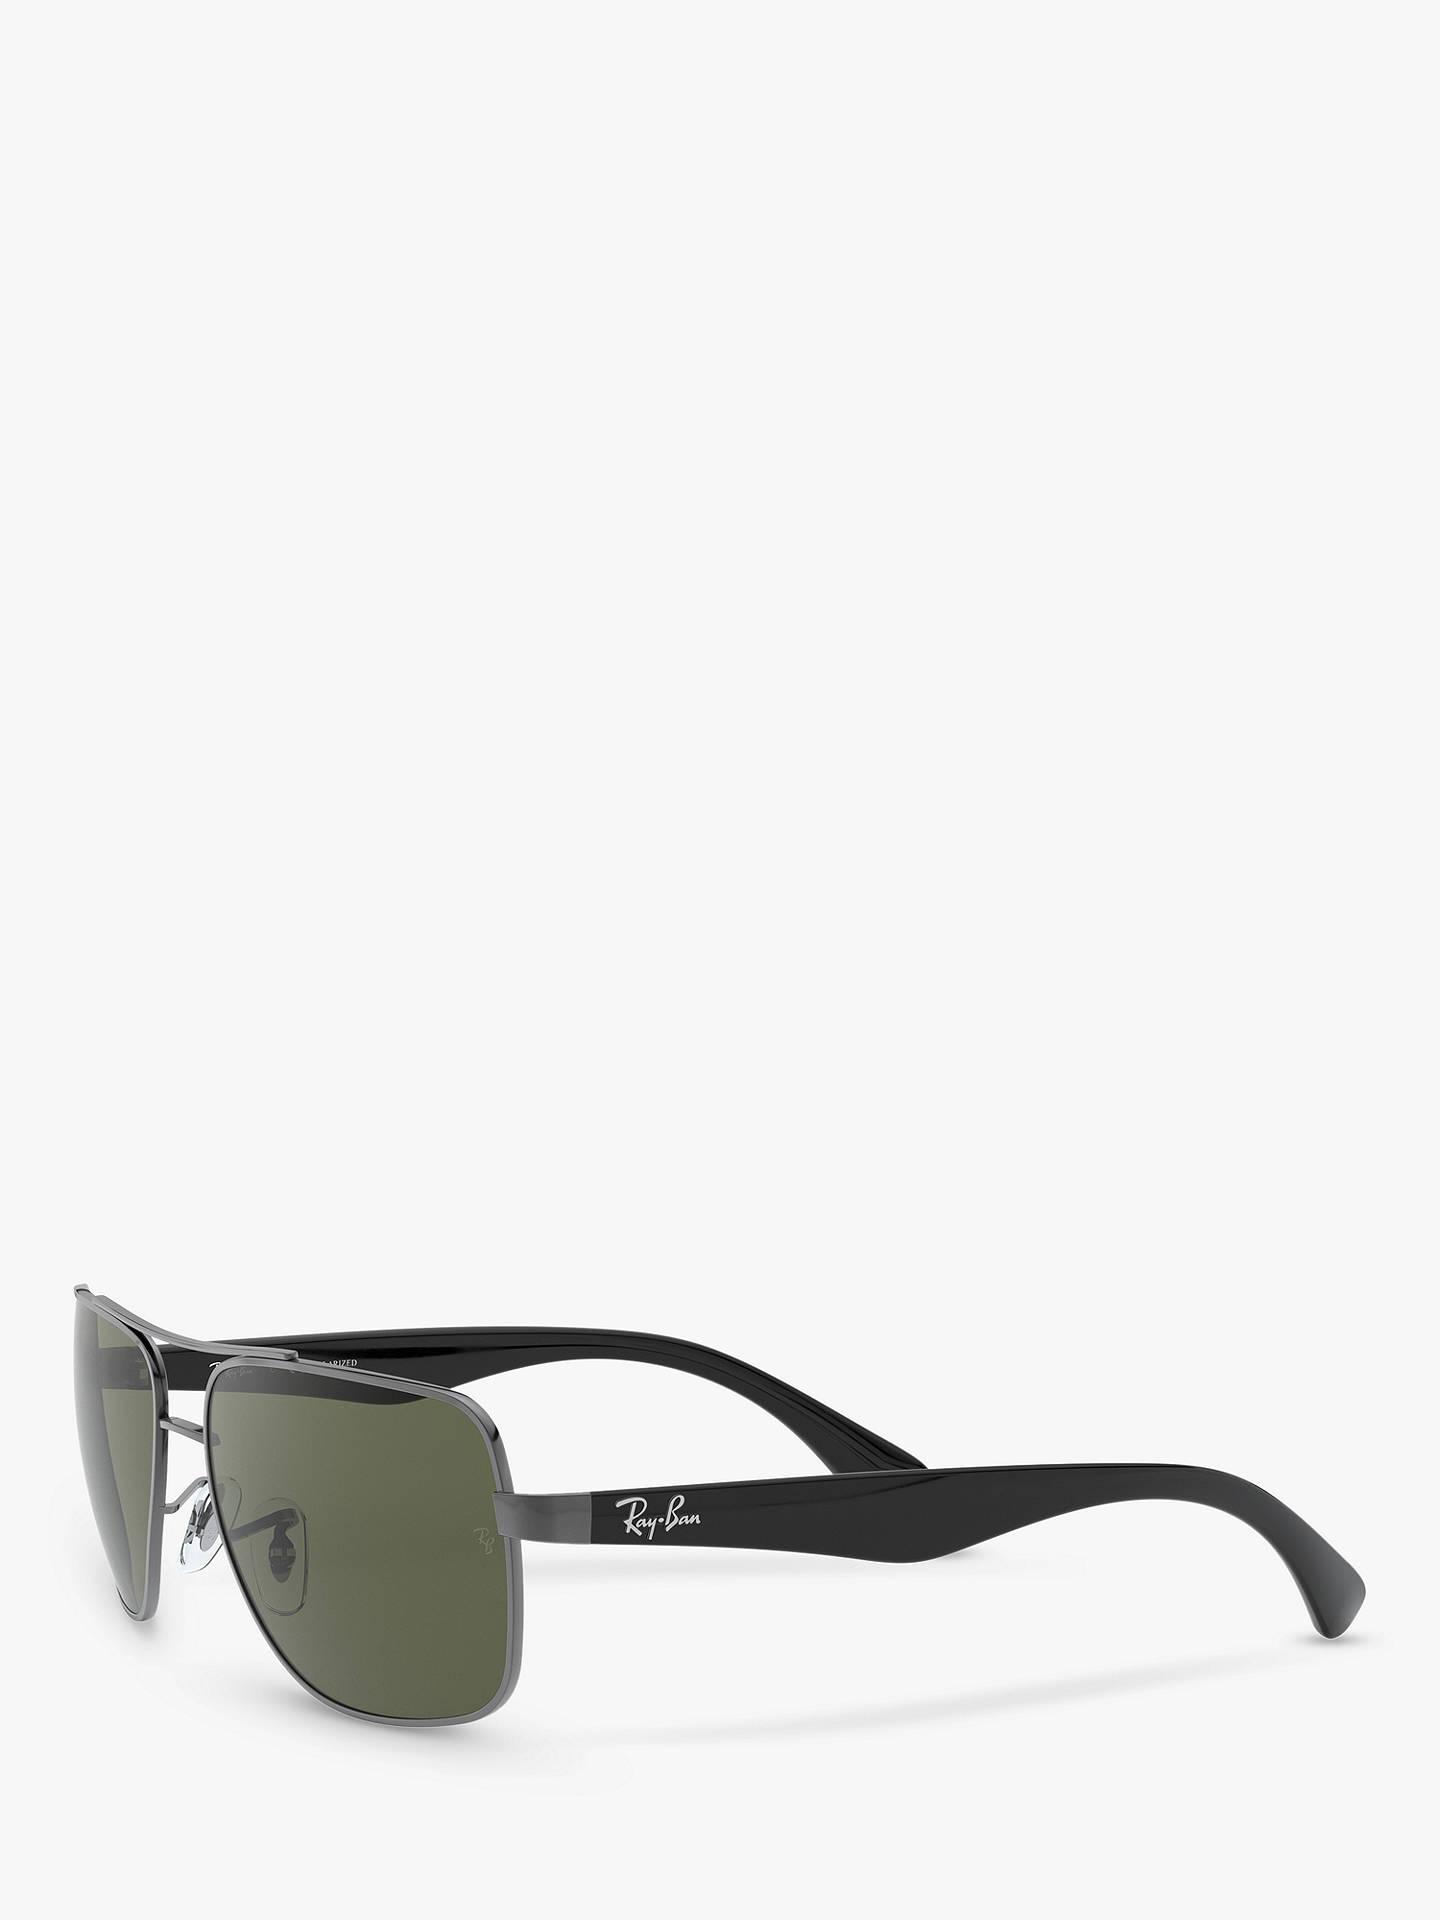 954fe907b5 ... BuyRay-Ban RB3483 Highstreet Polarised Square Sunglasses